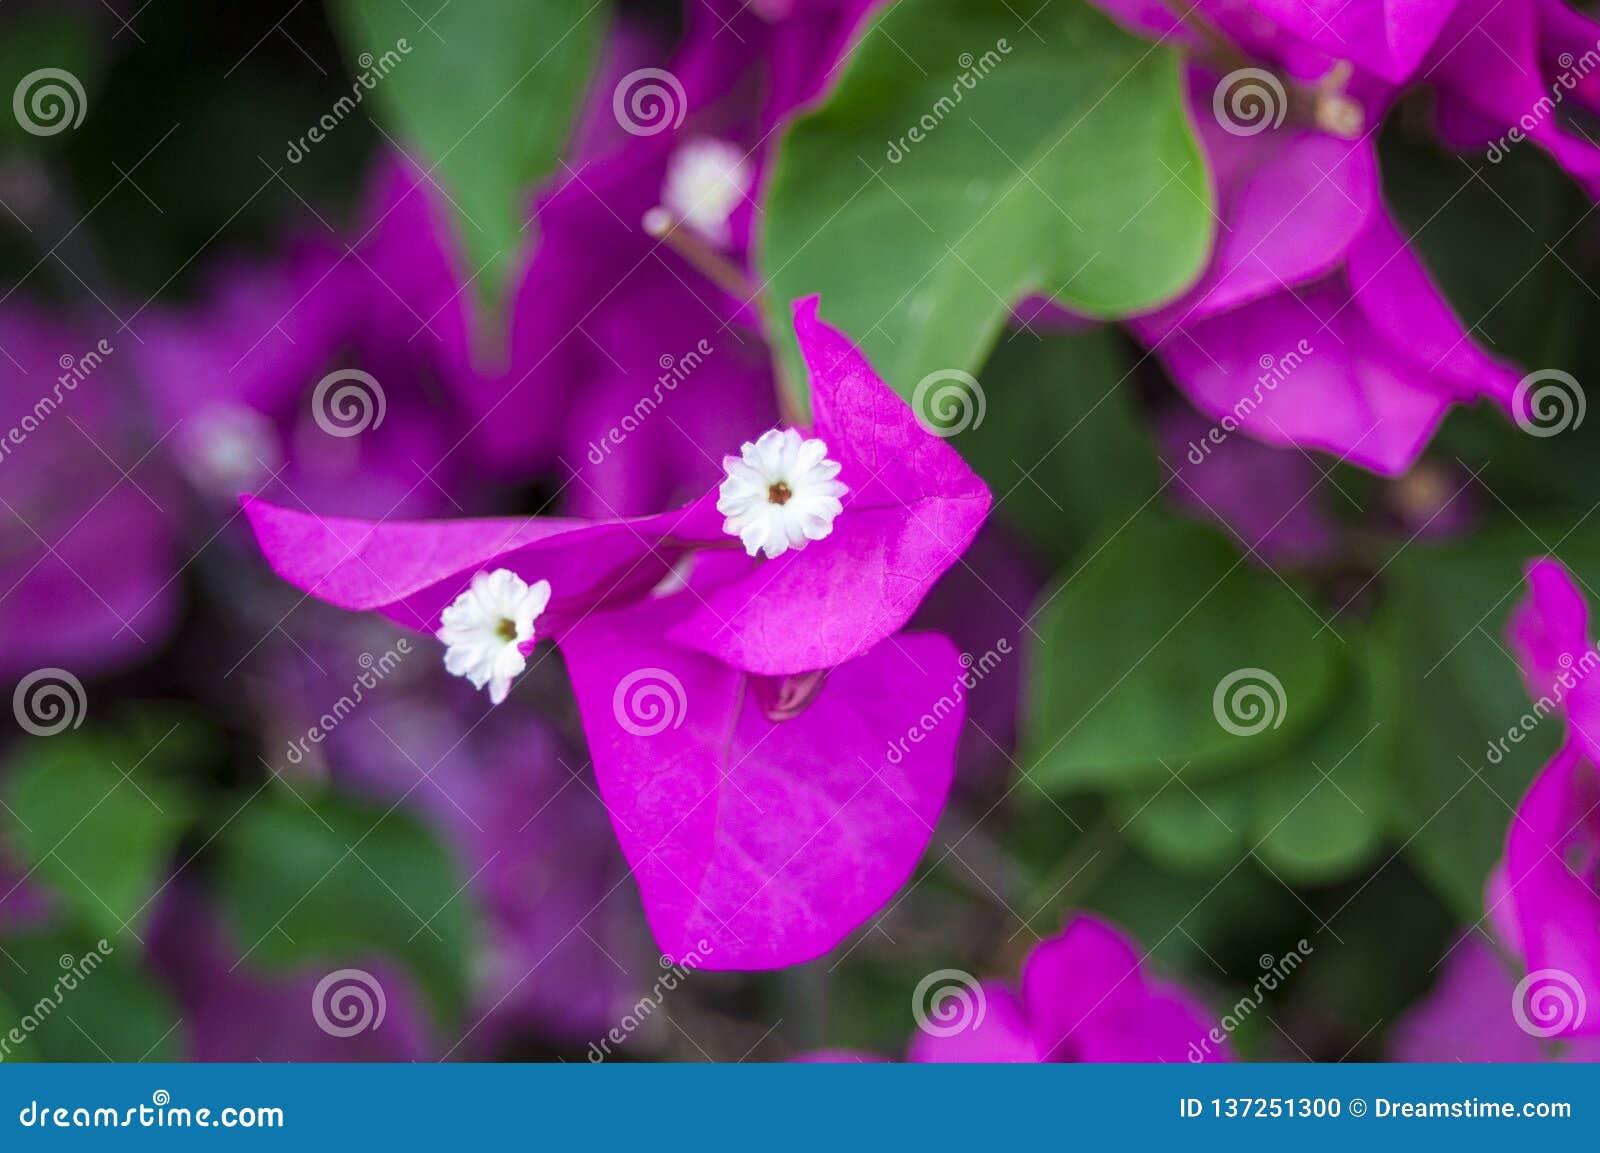 Tedere roze phalaenopsisorchidee op vage achtergrond De zachte mooie bloemen worden gezien in een artistieke samenstelling hybrid